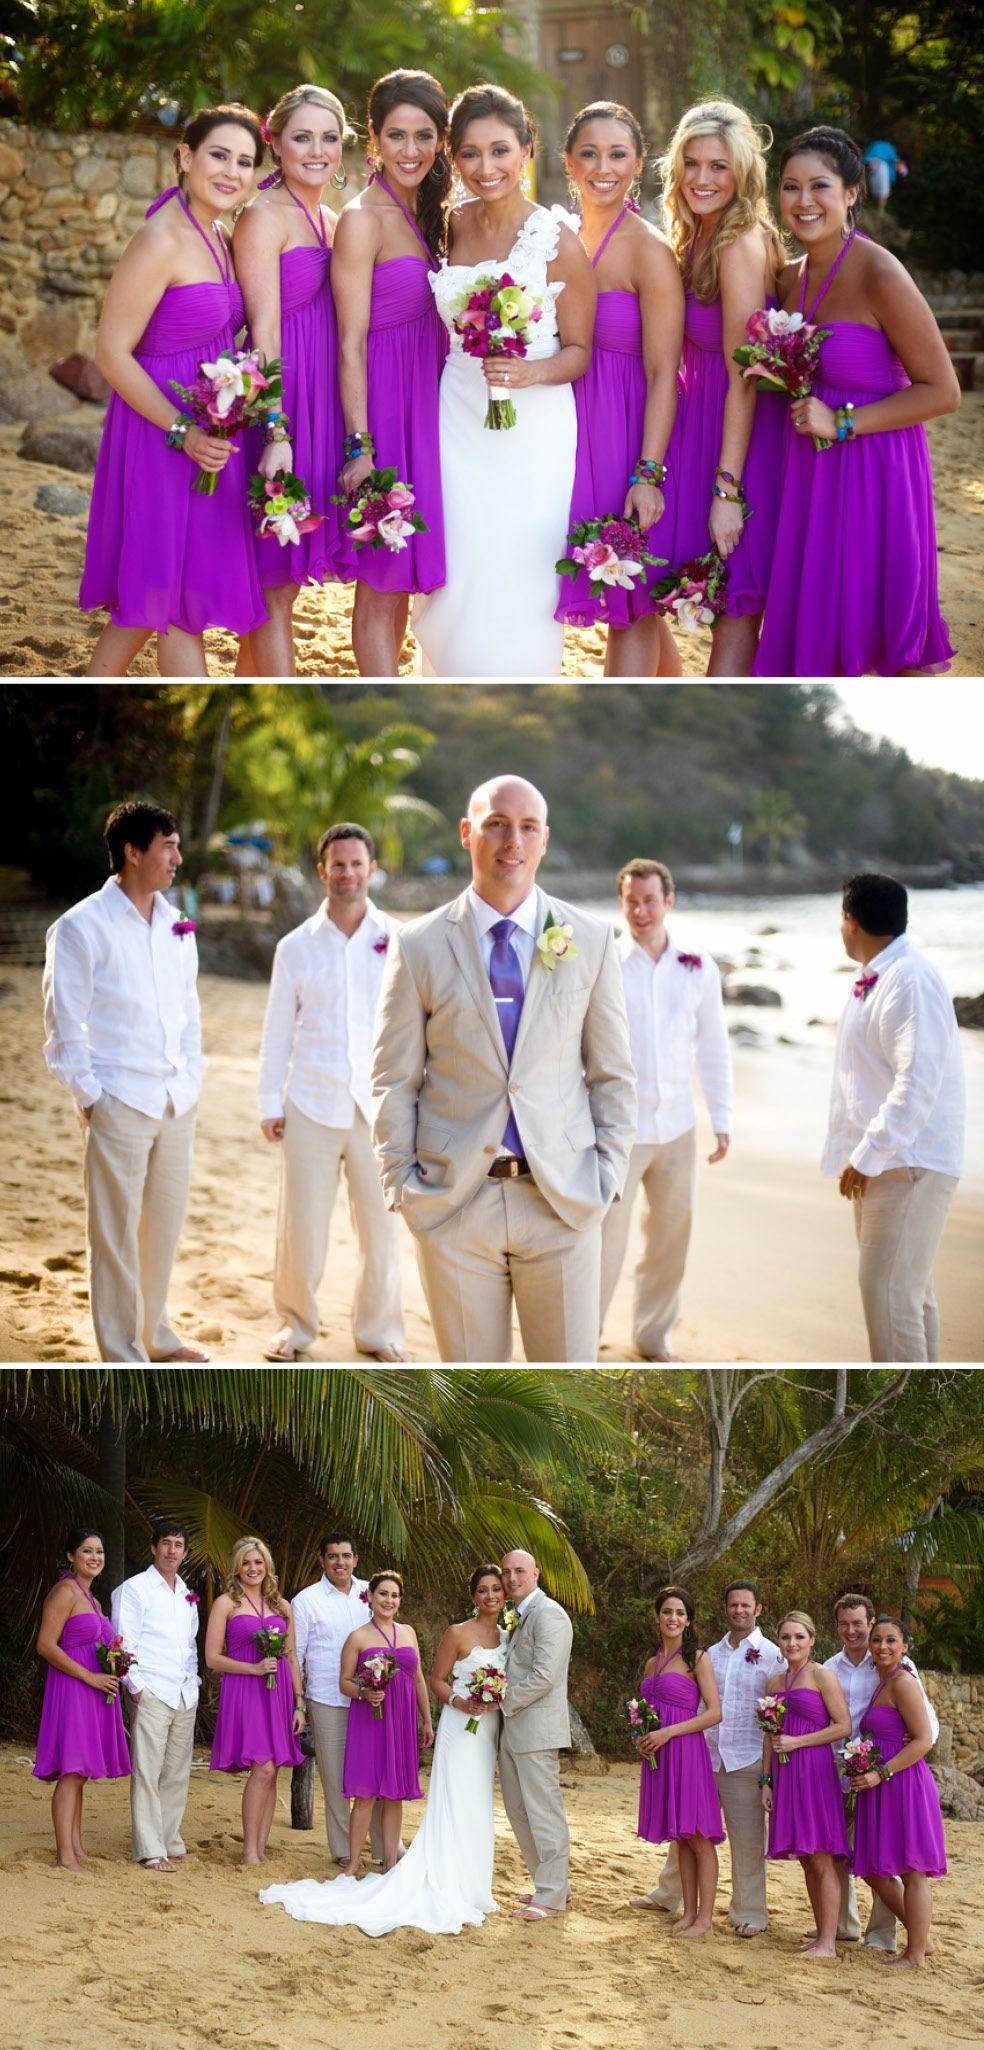 Puerto Vallarta Mexico Wedding At Las Caletas By Kristen Alexander Photography The Celebration Society